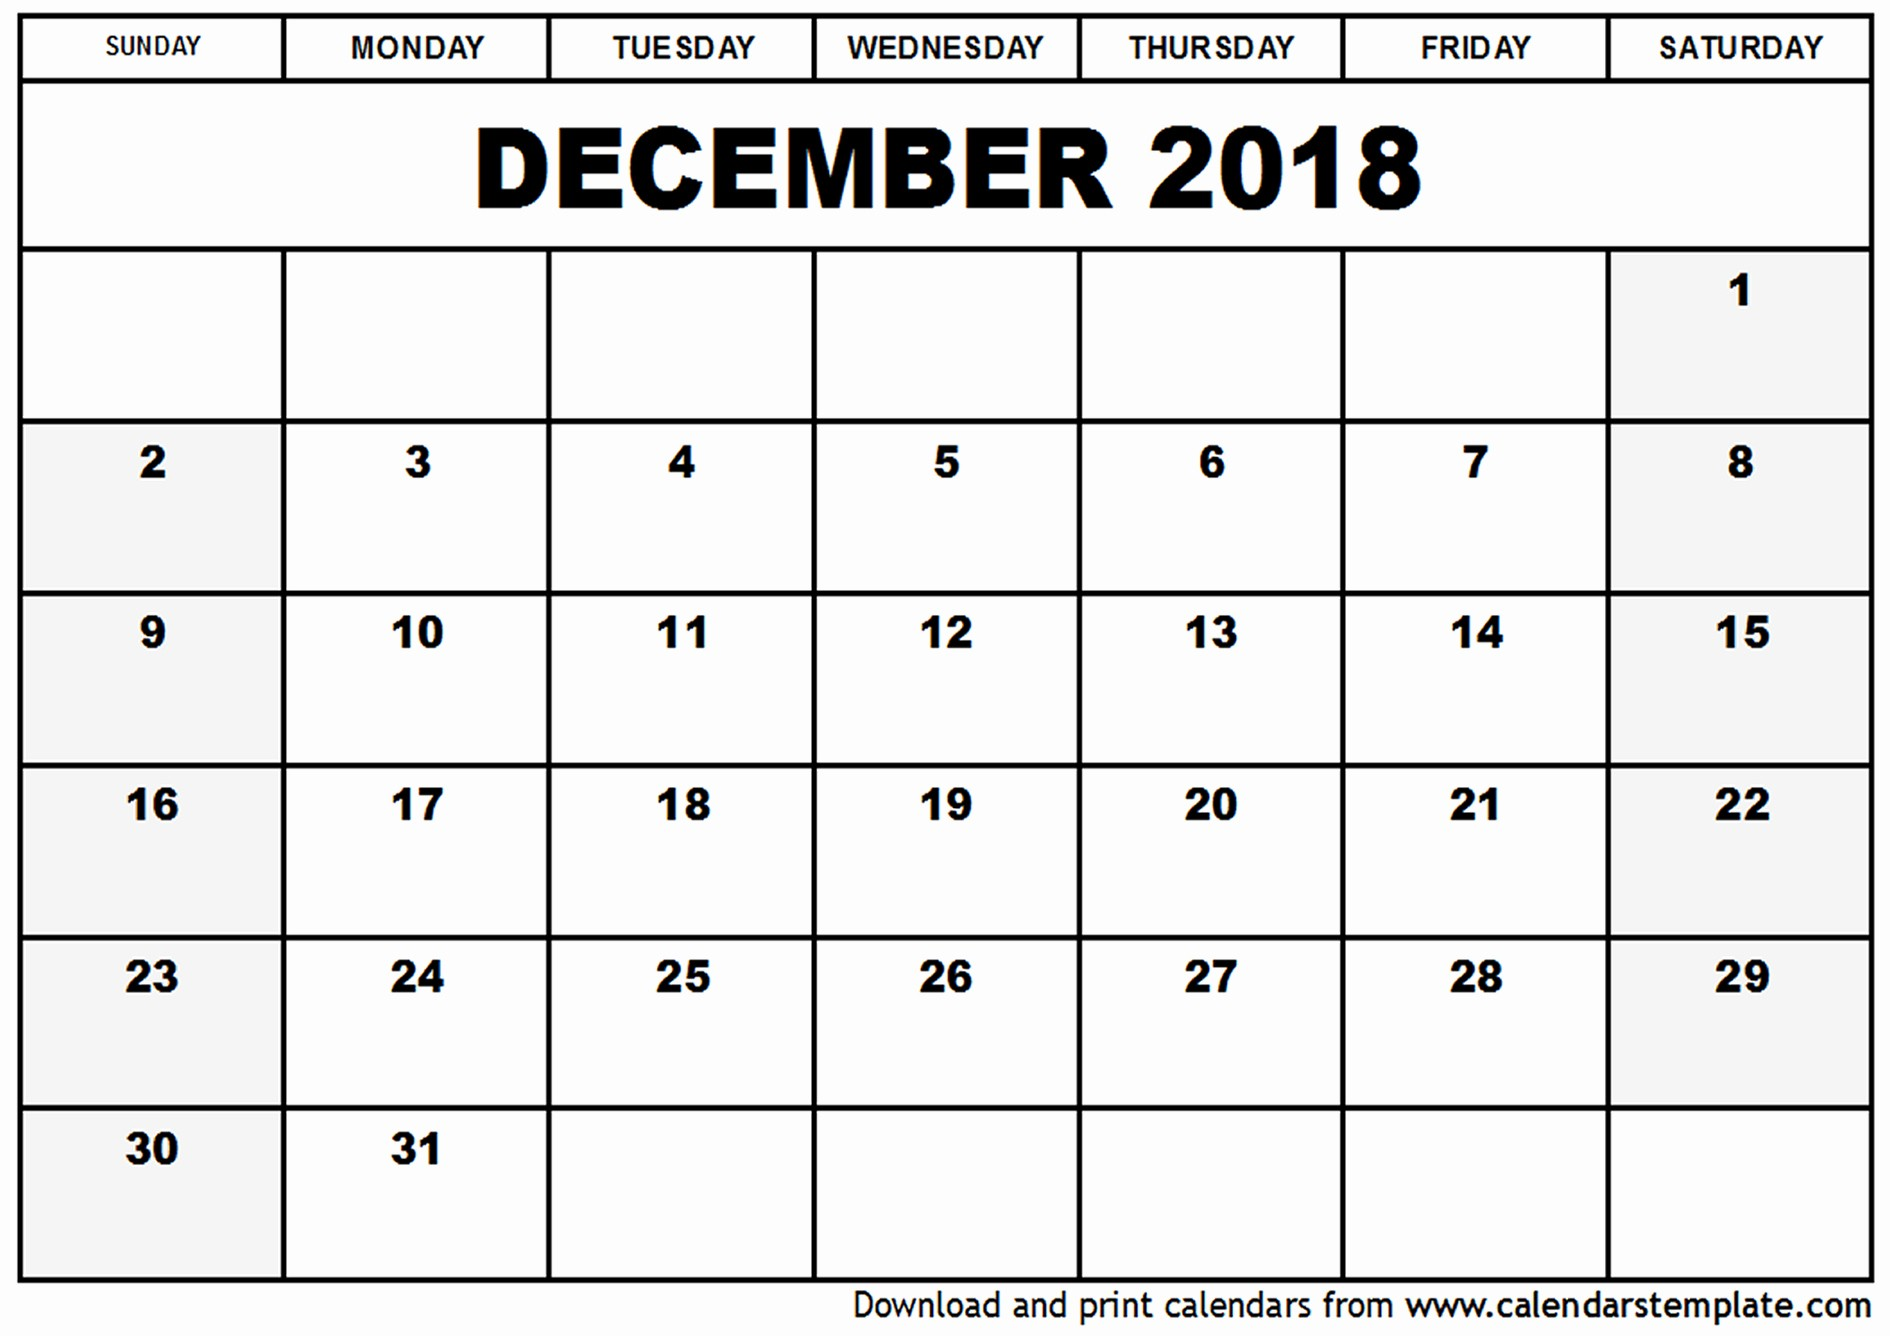 Blank Calendar Template December 2018 Lovely December 2018 Calendar Pdf